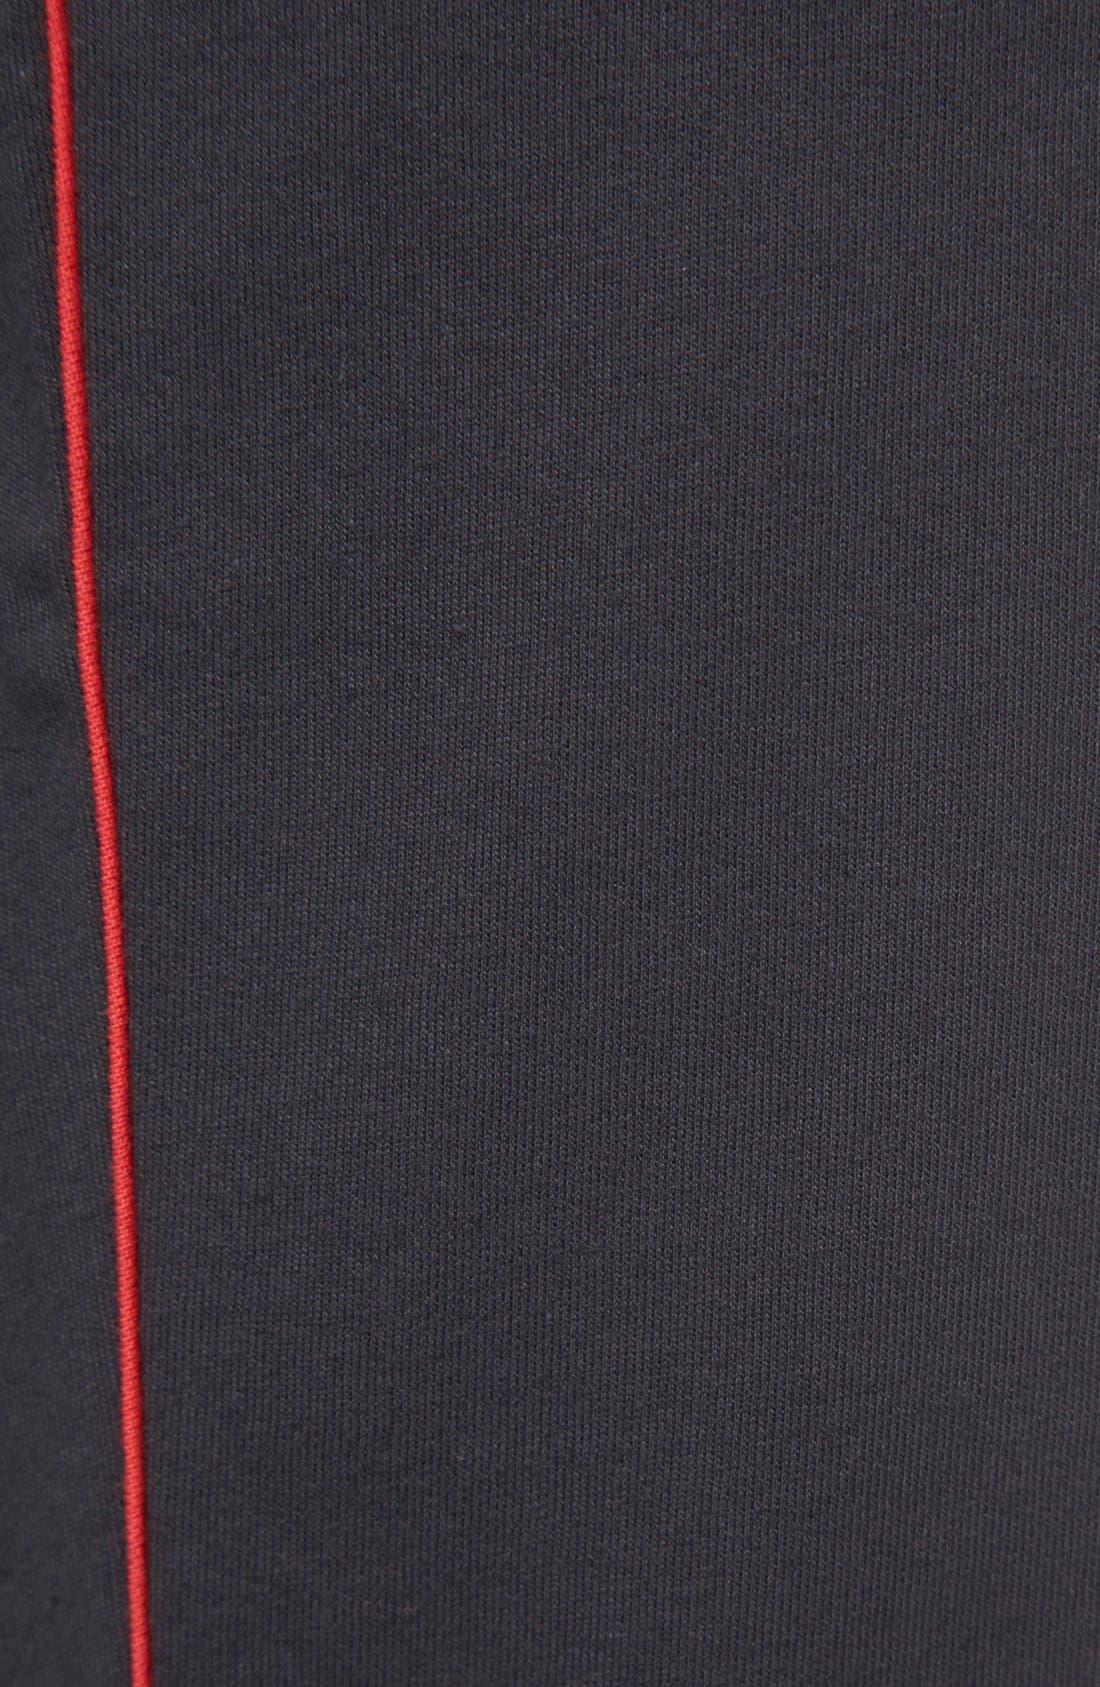 Alternate Image 3  - BOSS HUGO BOSS Cotton Lounge Pants